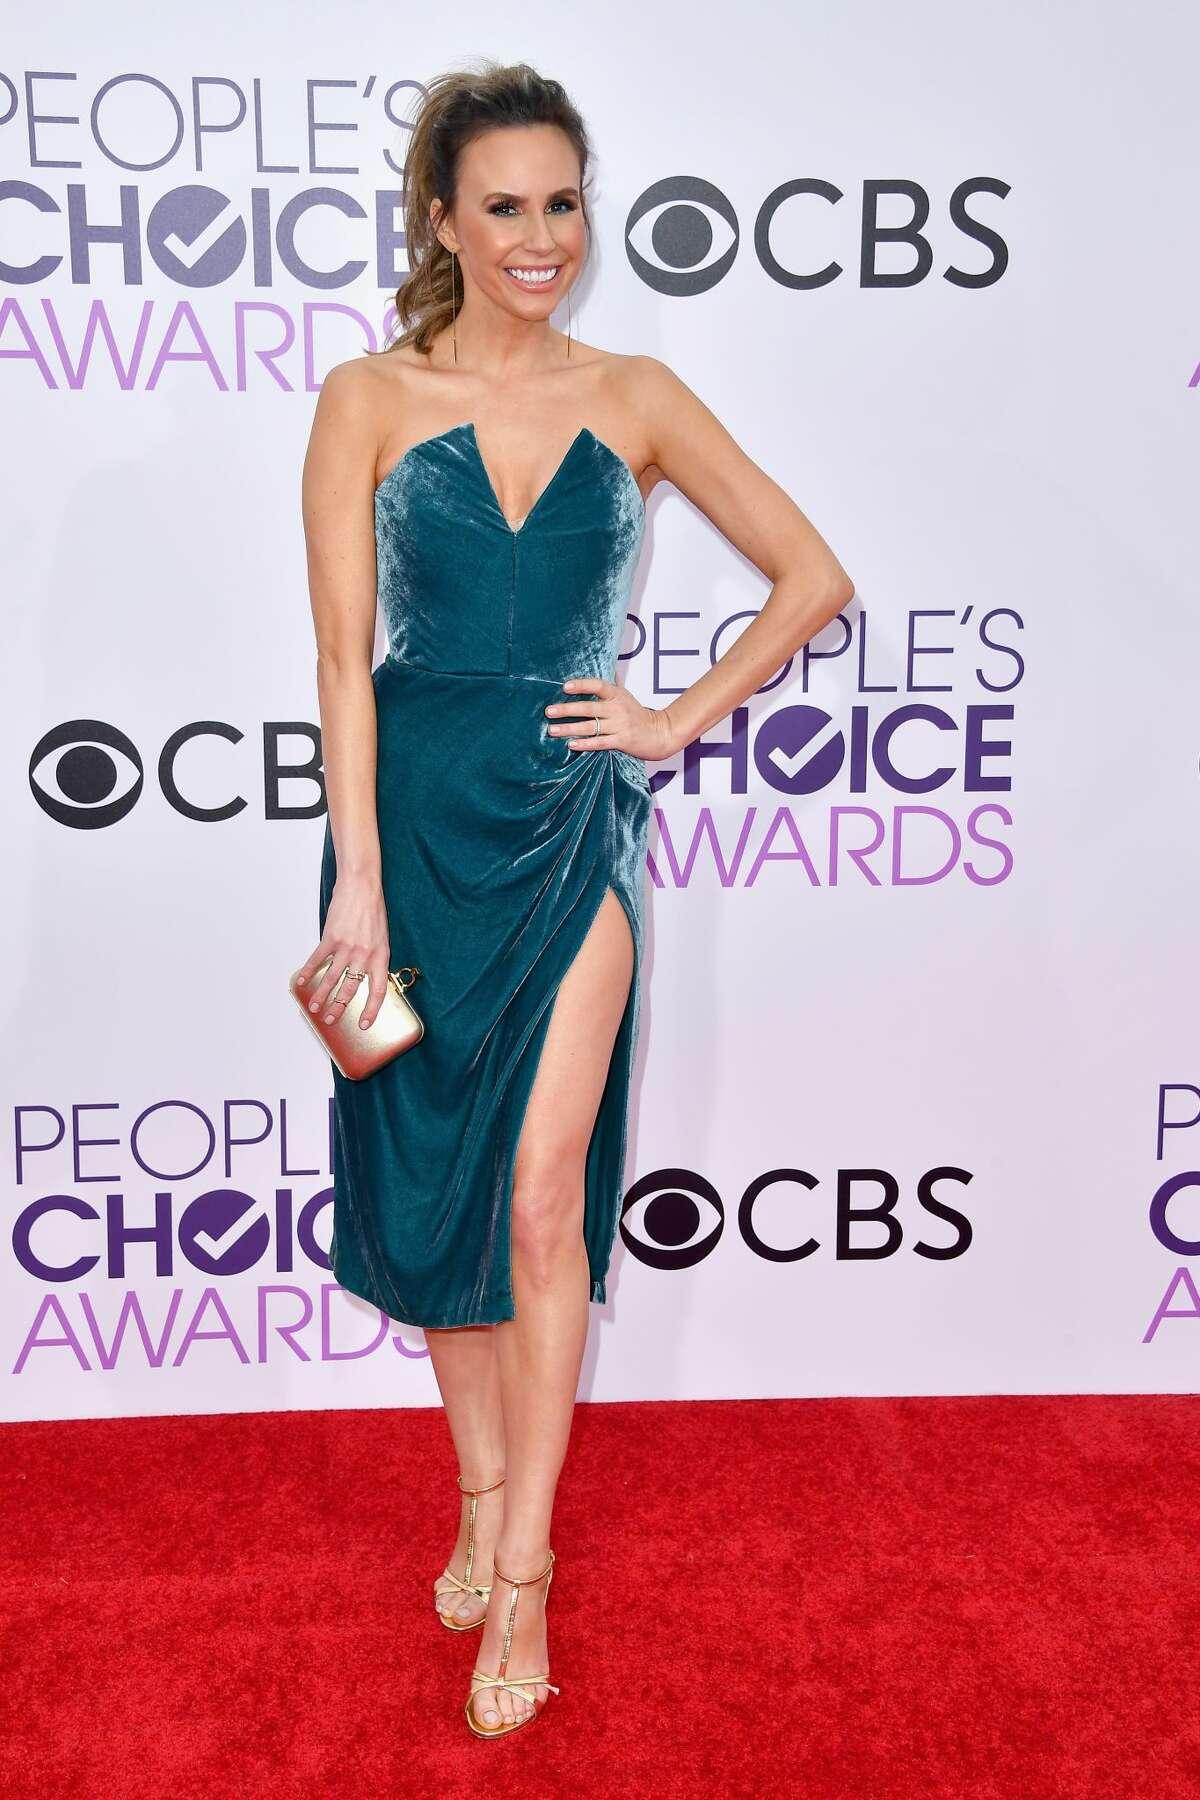 Best: TV personality Keltie Knight wears a trendy dress in a beautiful shade of blue. Nice slit too.